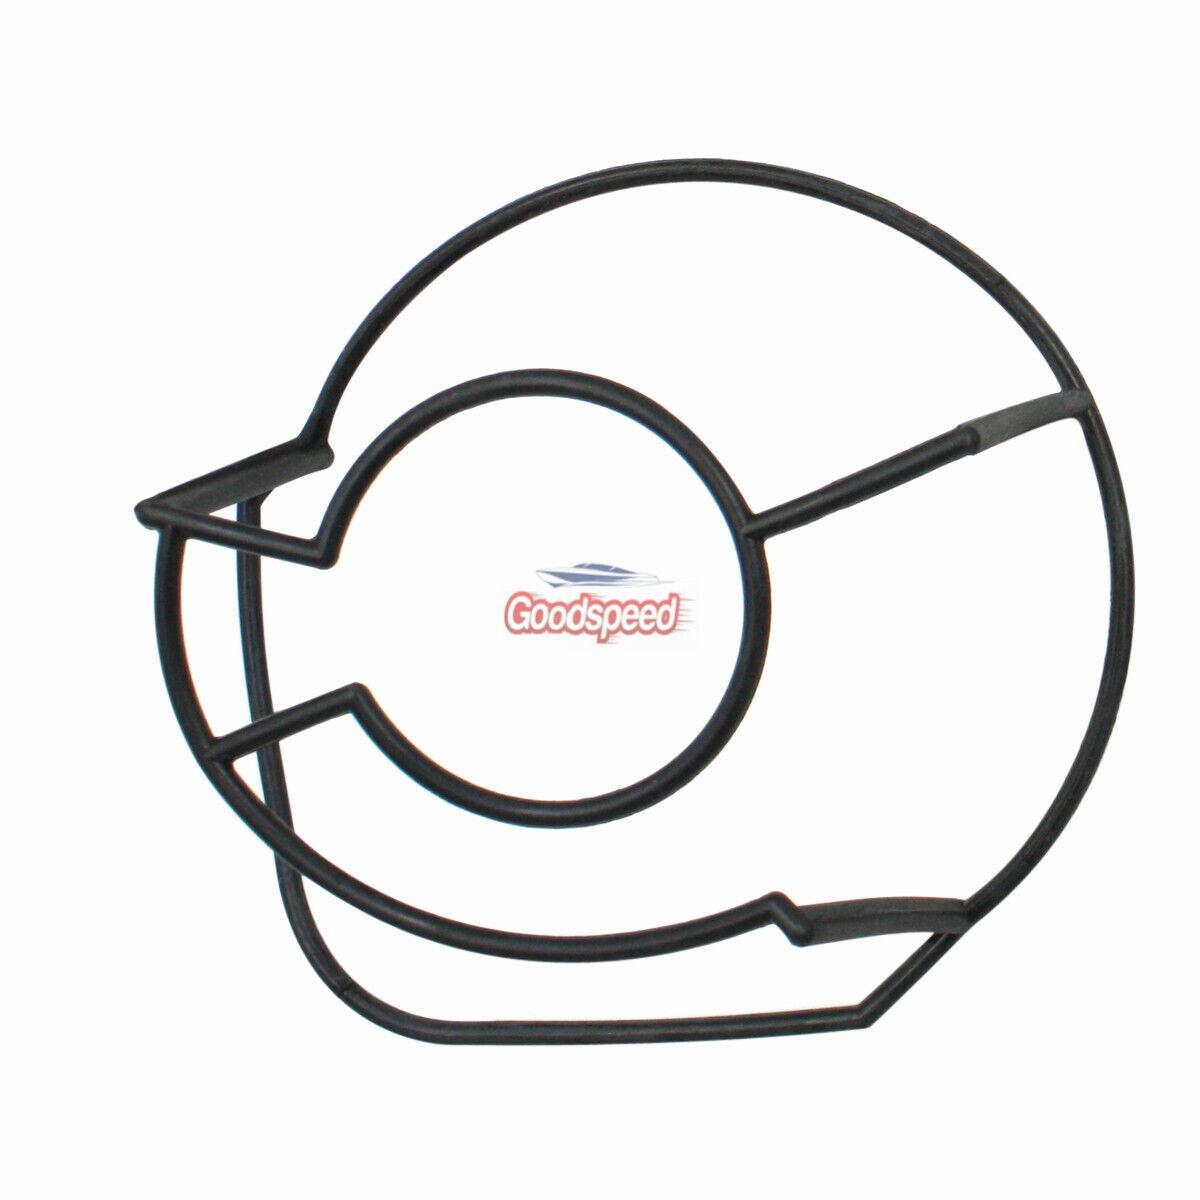 Water Pump Repair Kit 17400-98J01 for Suzuki Marine 200hp